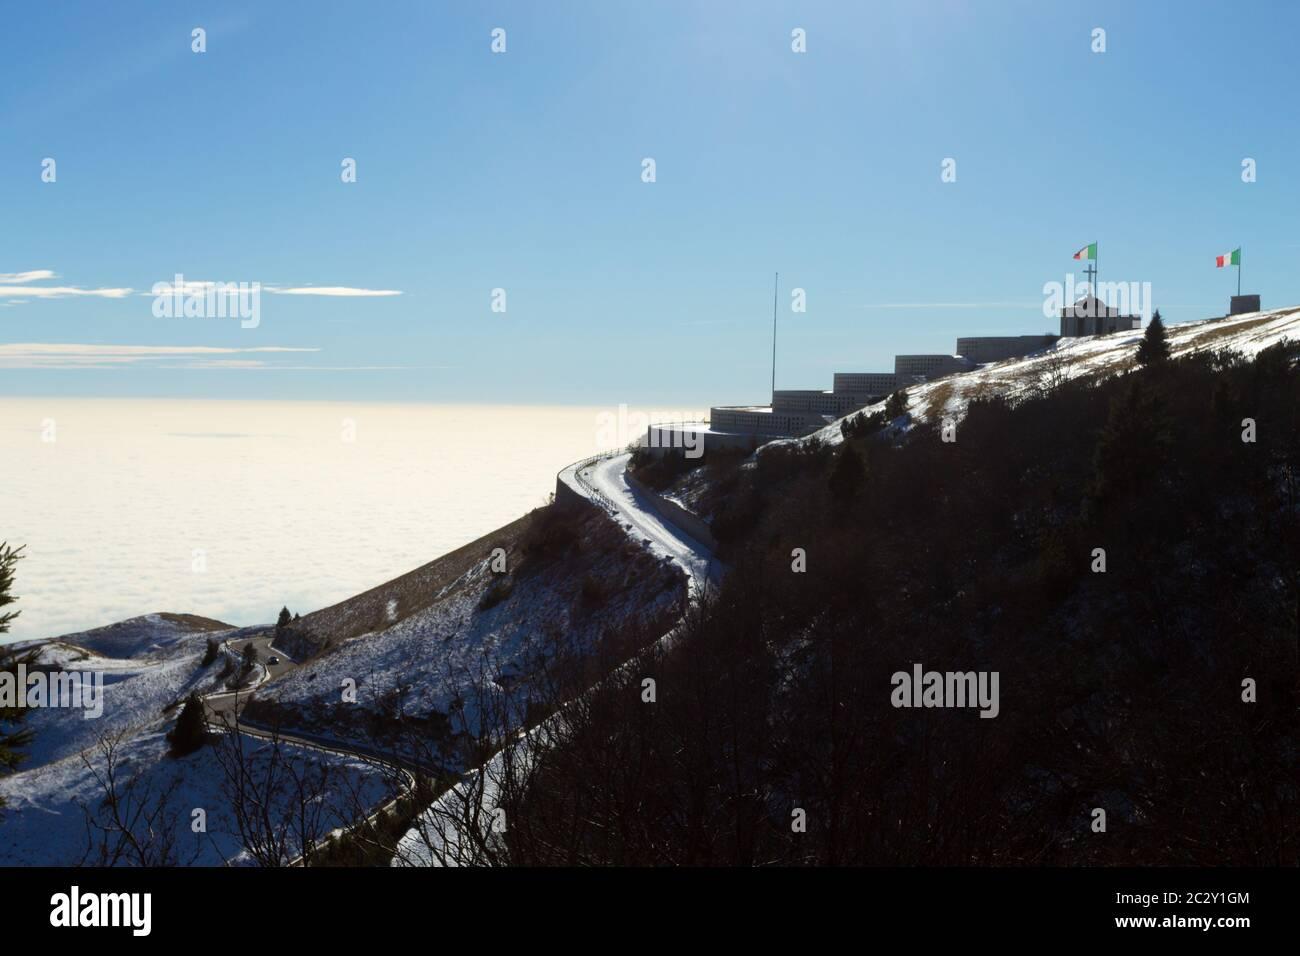 Monte grappa first world war memorial winter view, Italy. Italian landmark Stock Photo